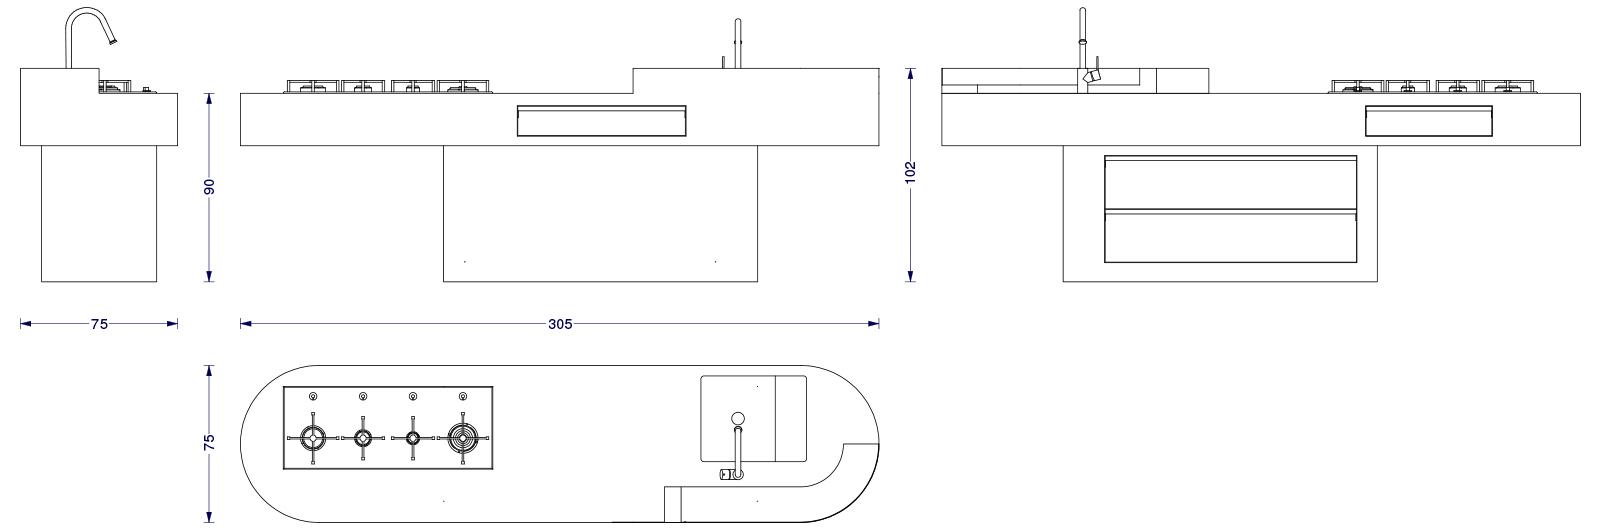 maki-ortner-furniture-kitchen-clara-04_plan.jpg